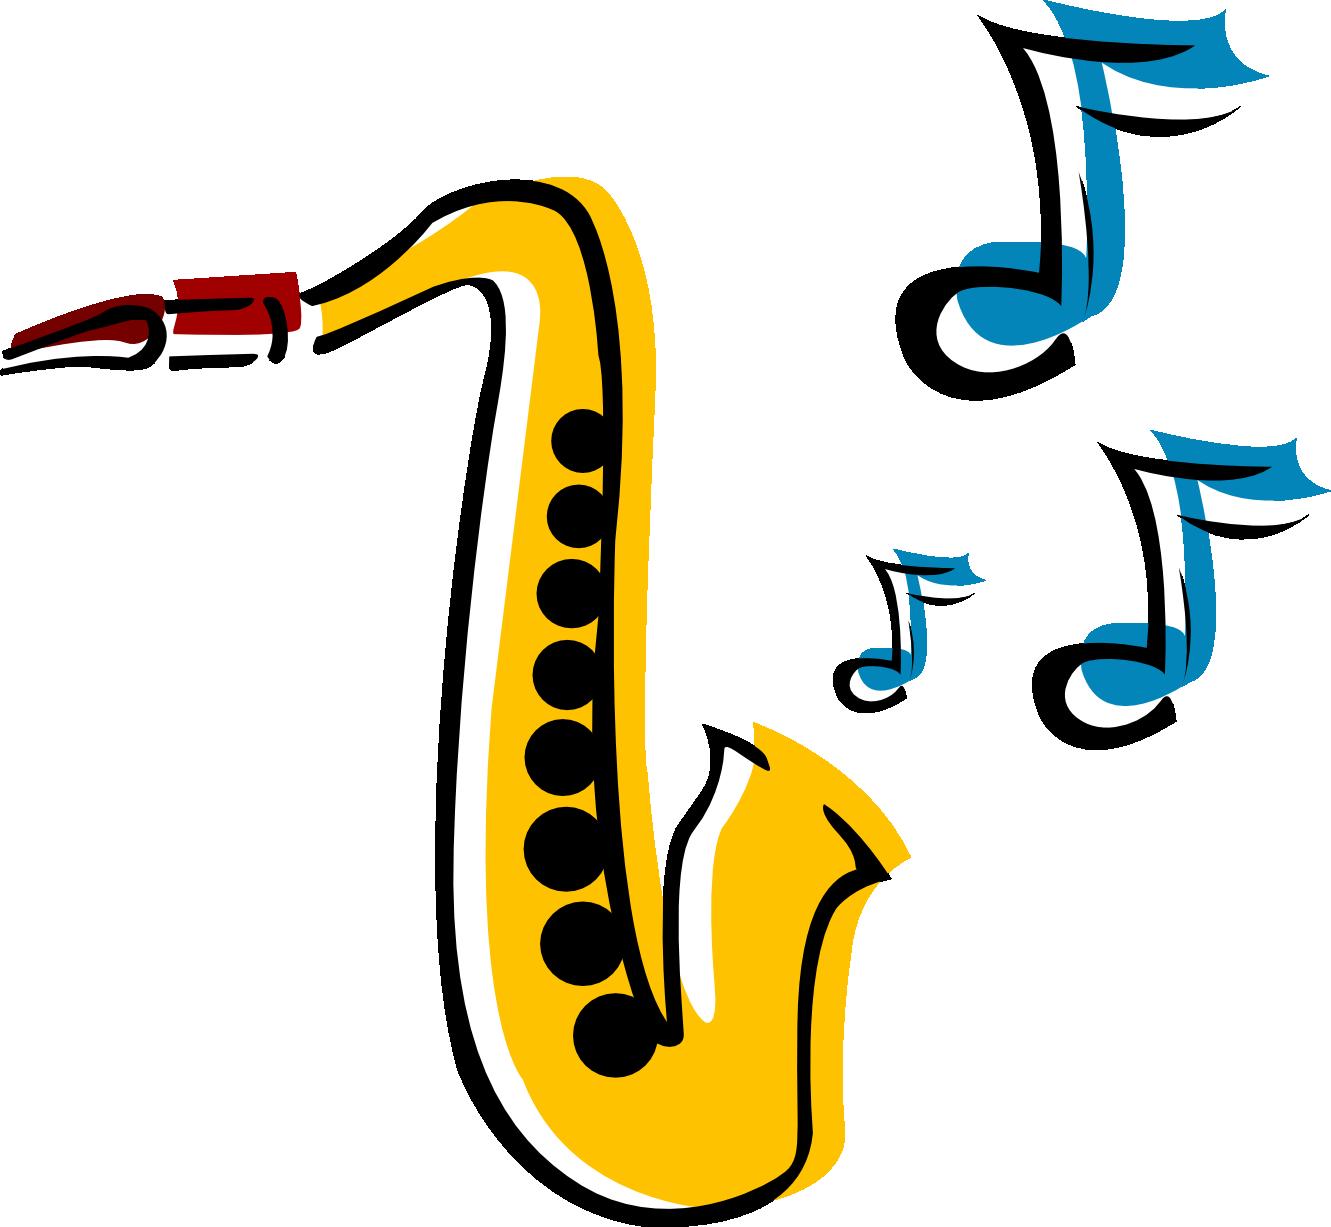 Saxophone clipart 5 - Free PNG Saxophone